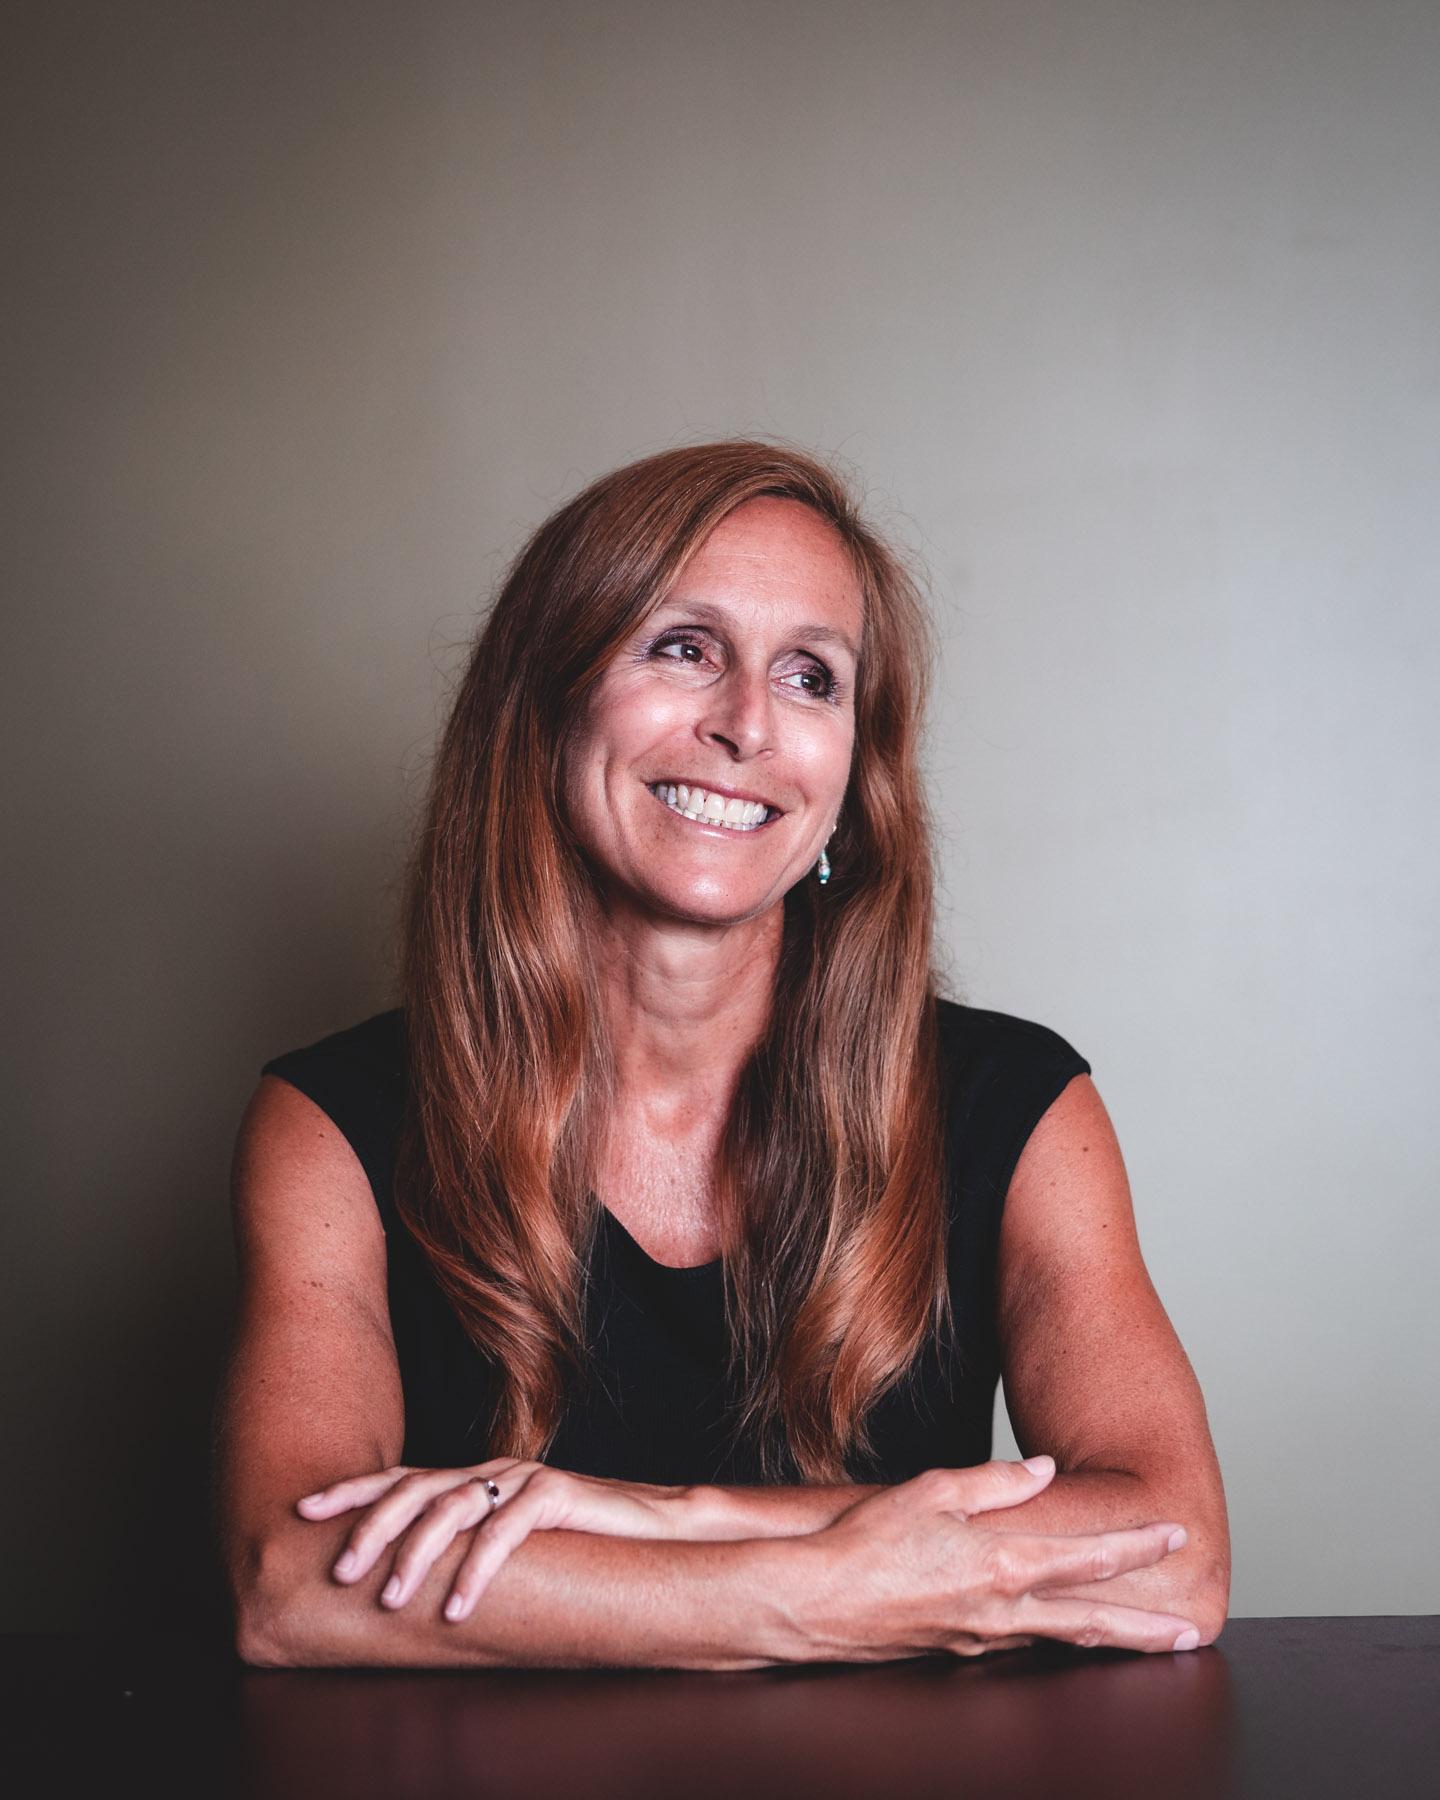 Susan Yungblut